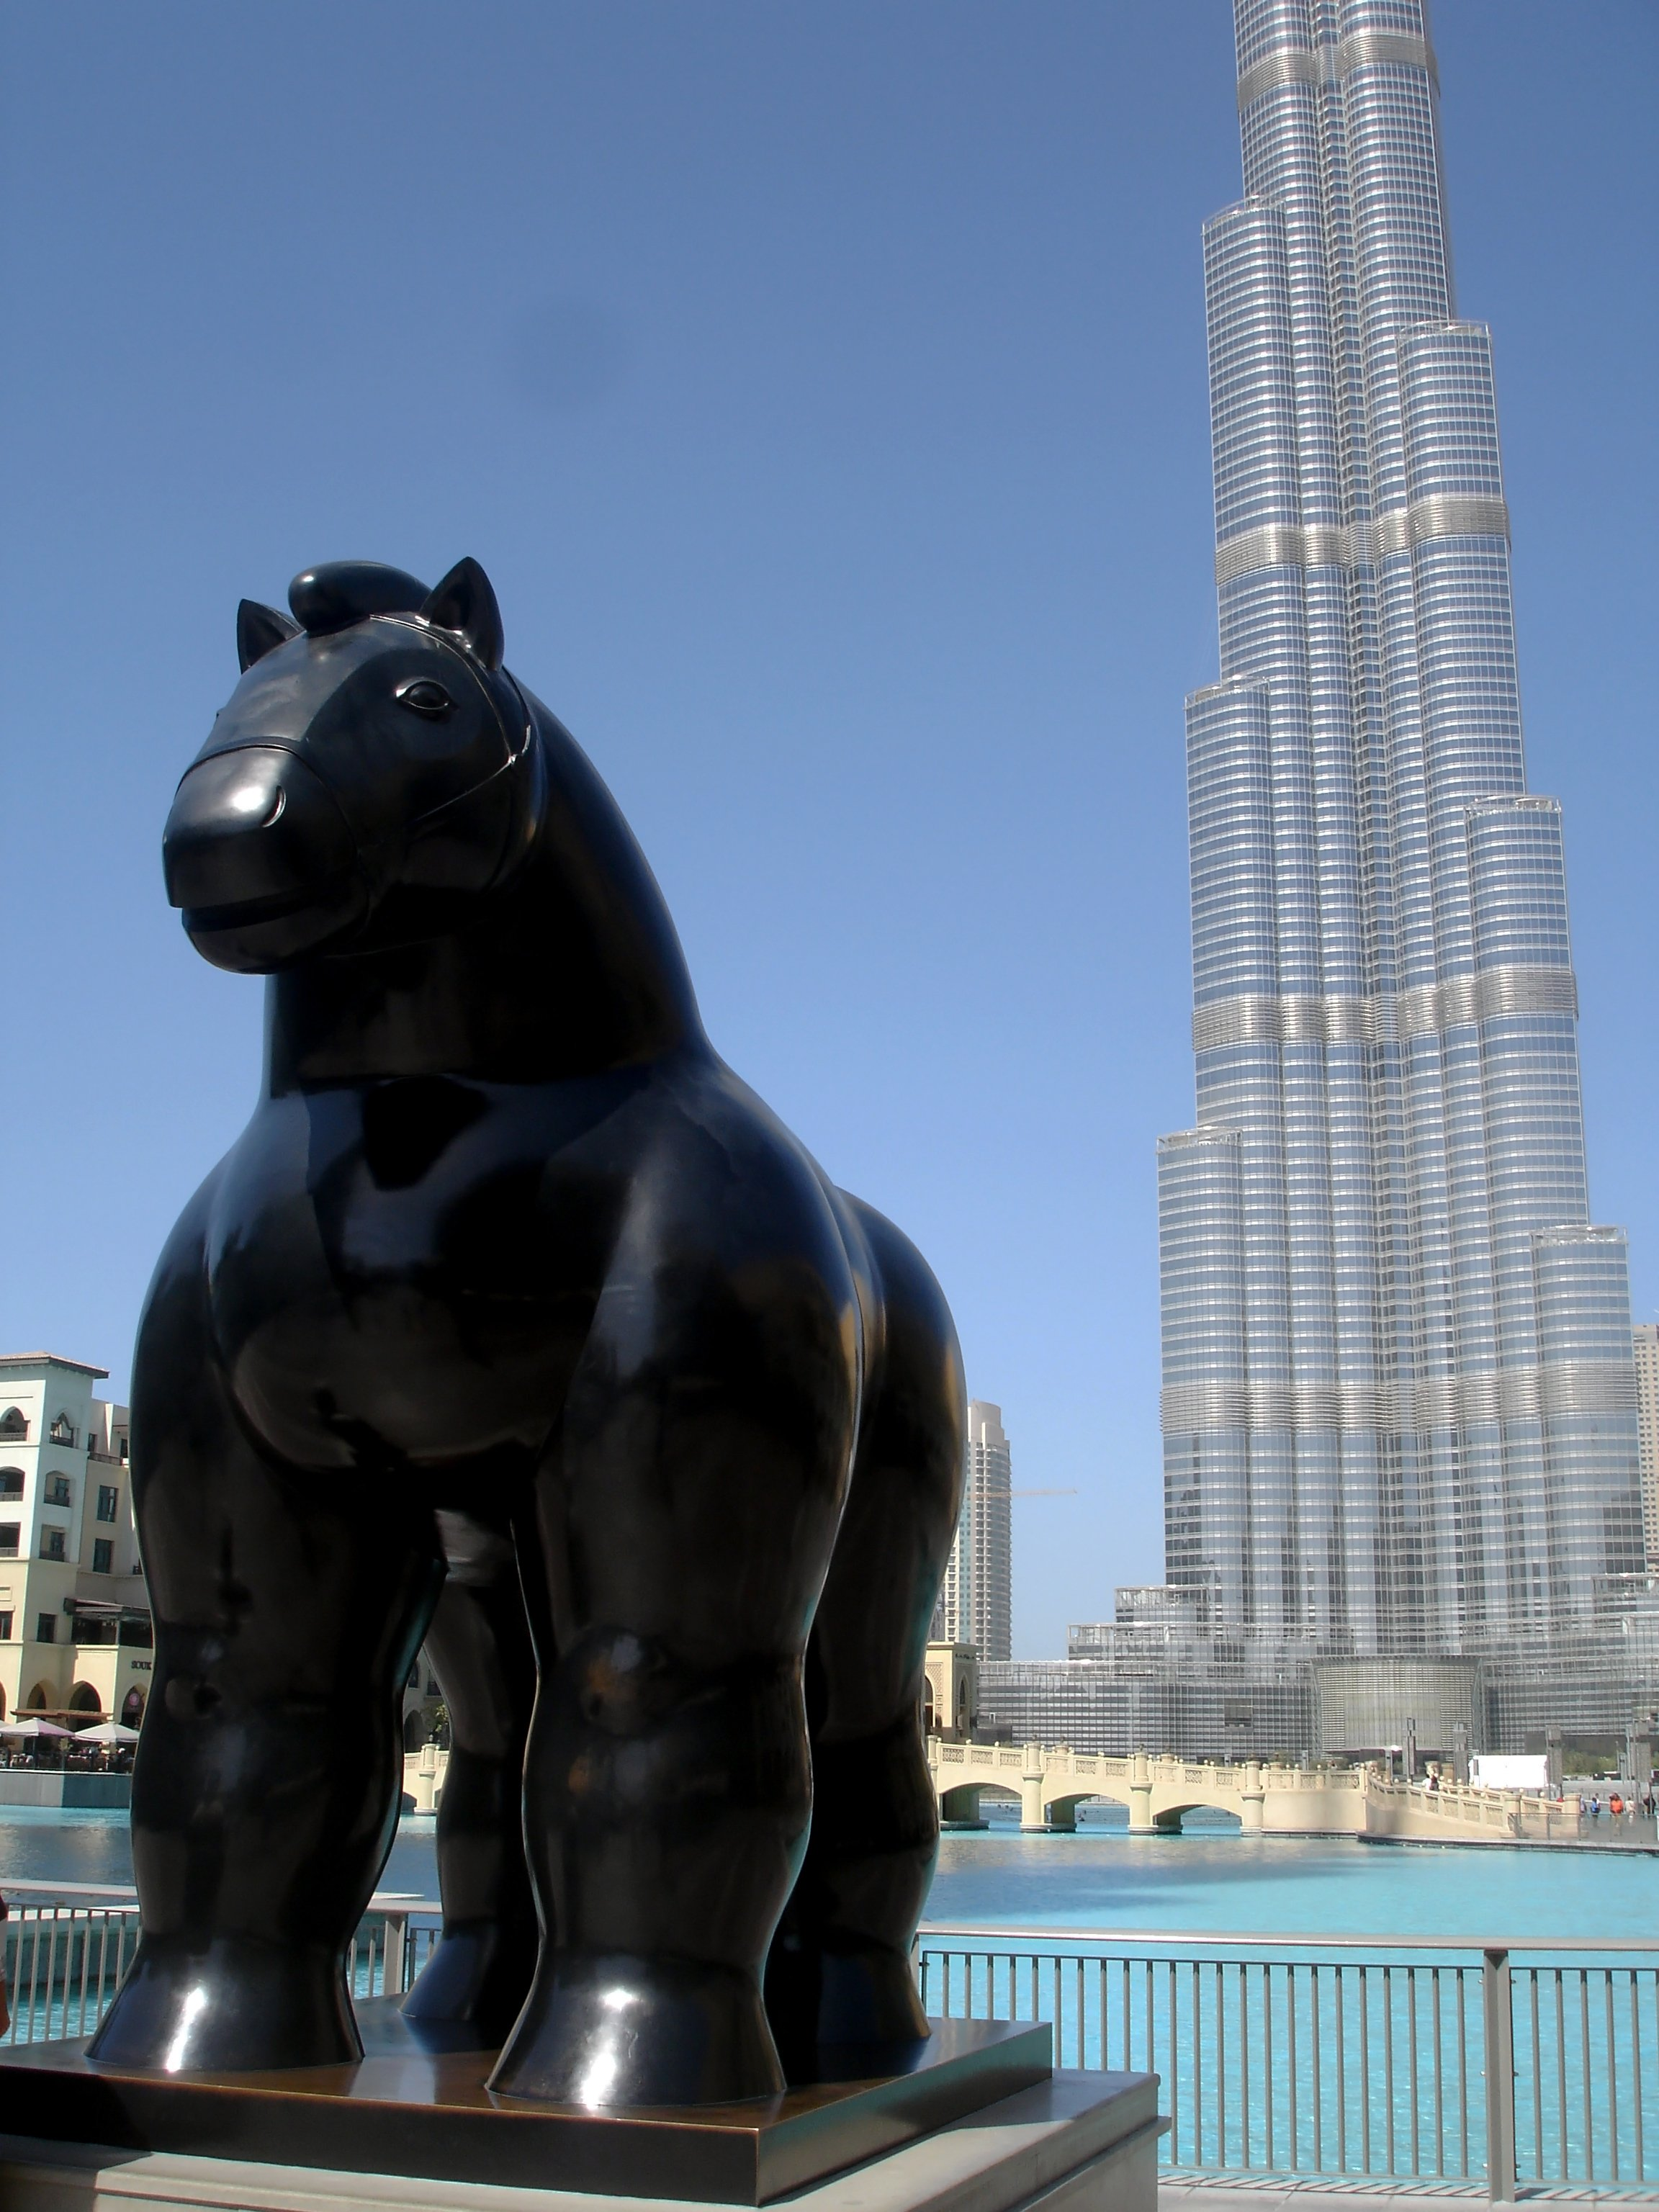 Burj Khalifa – Modern Icon of the Middle East